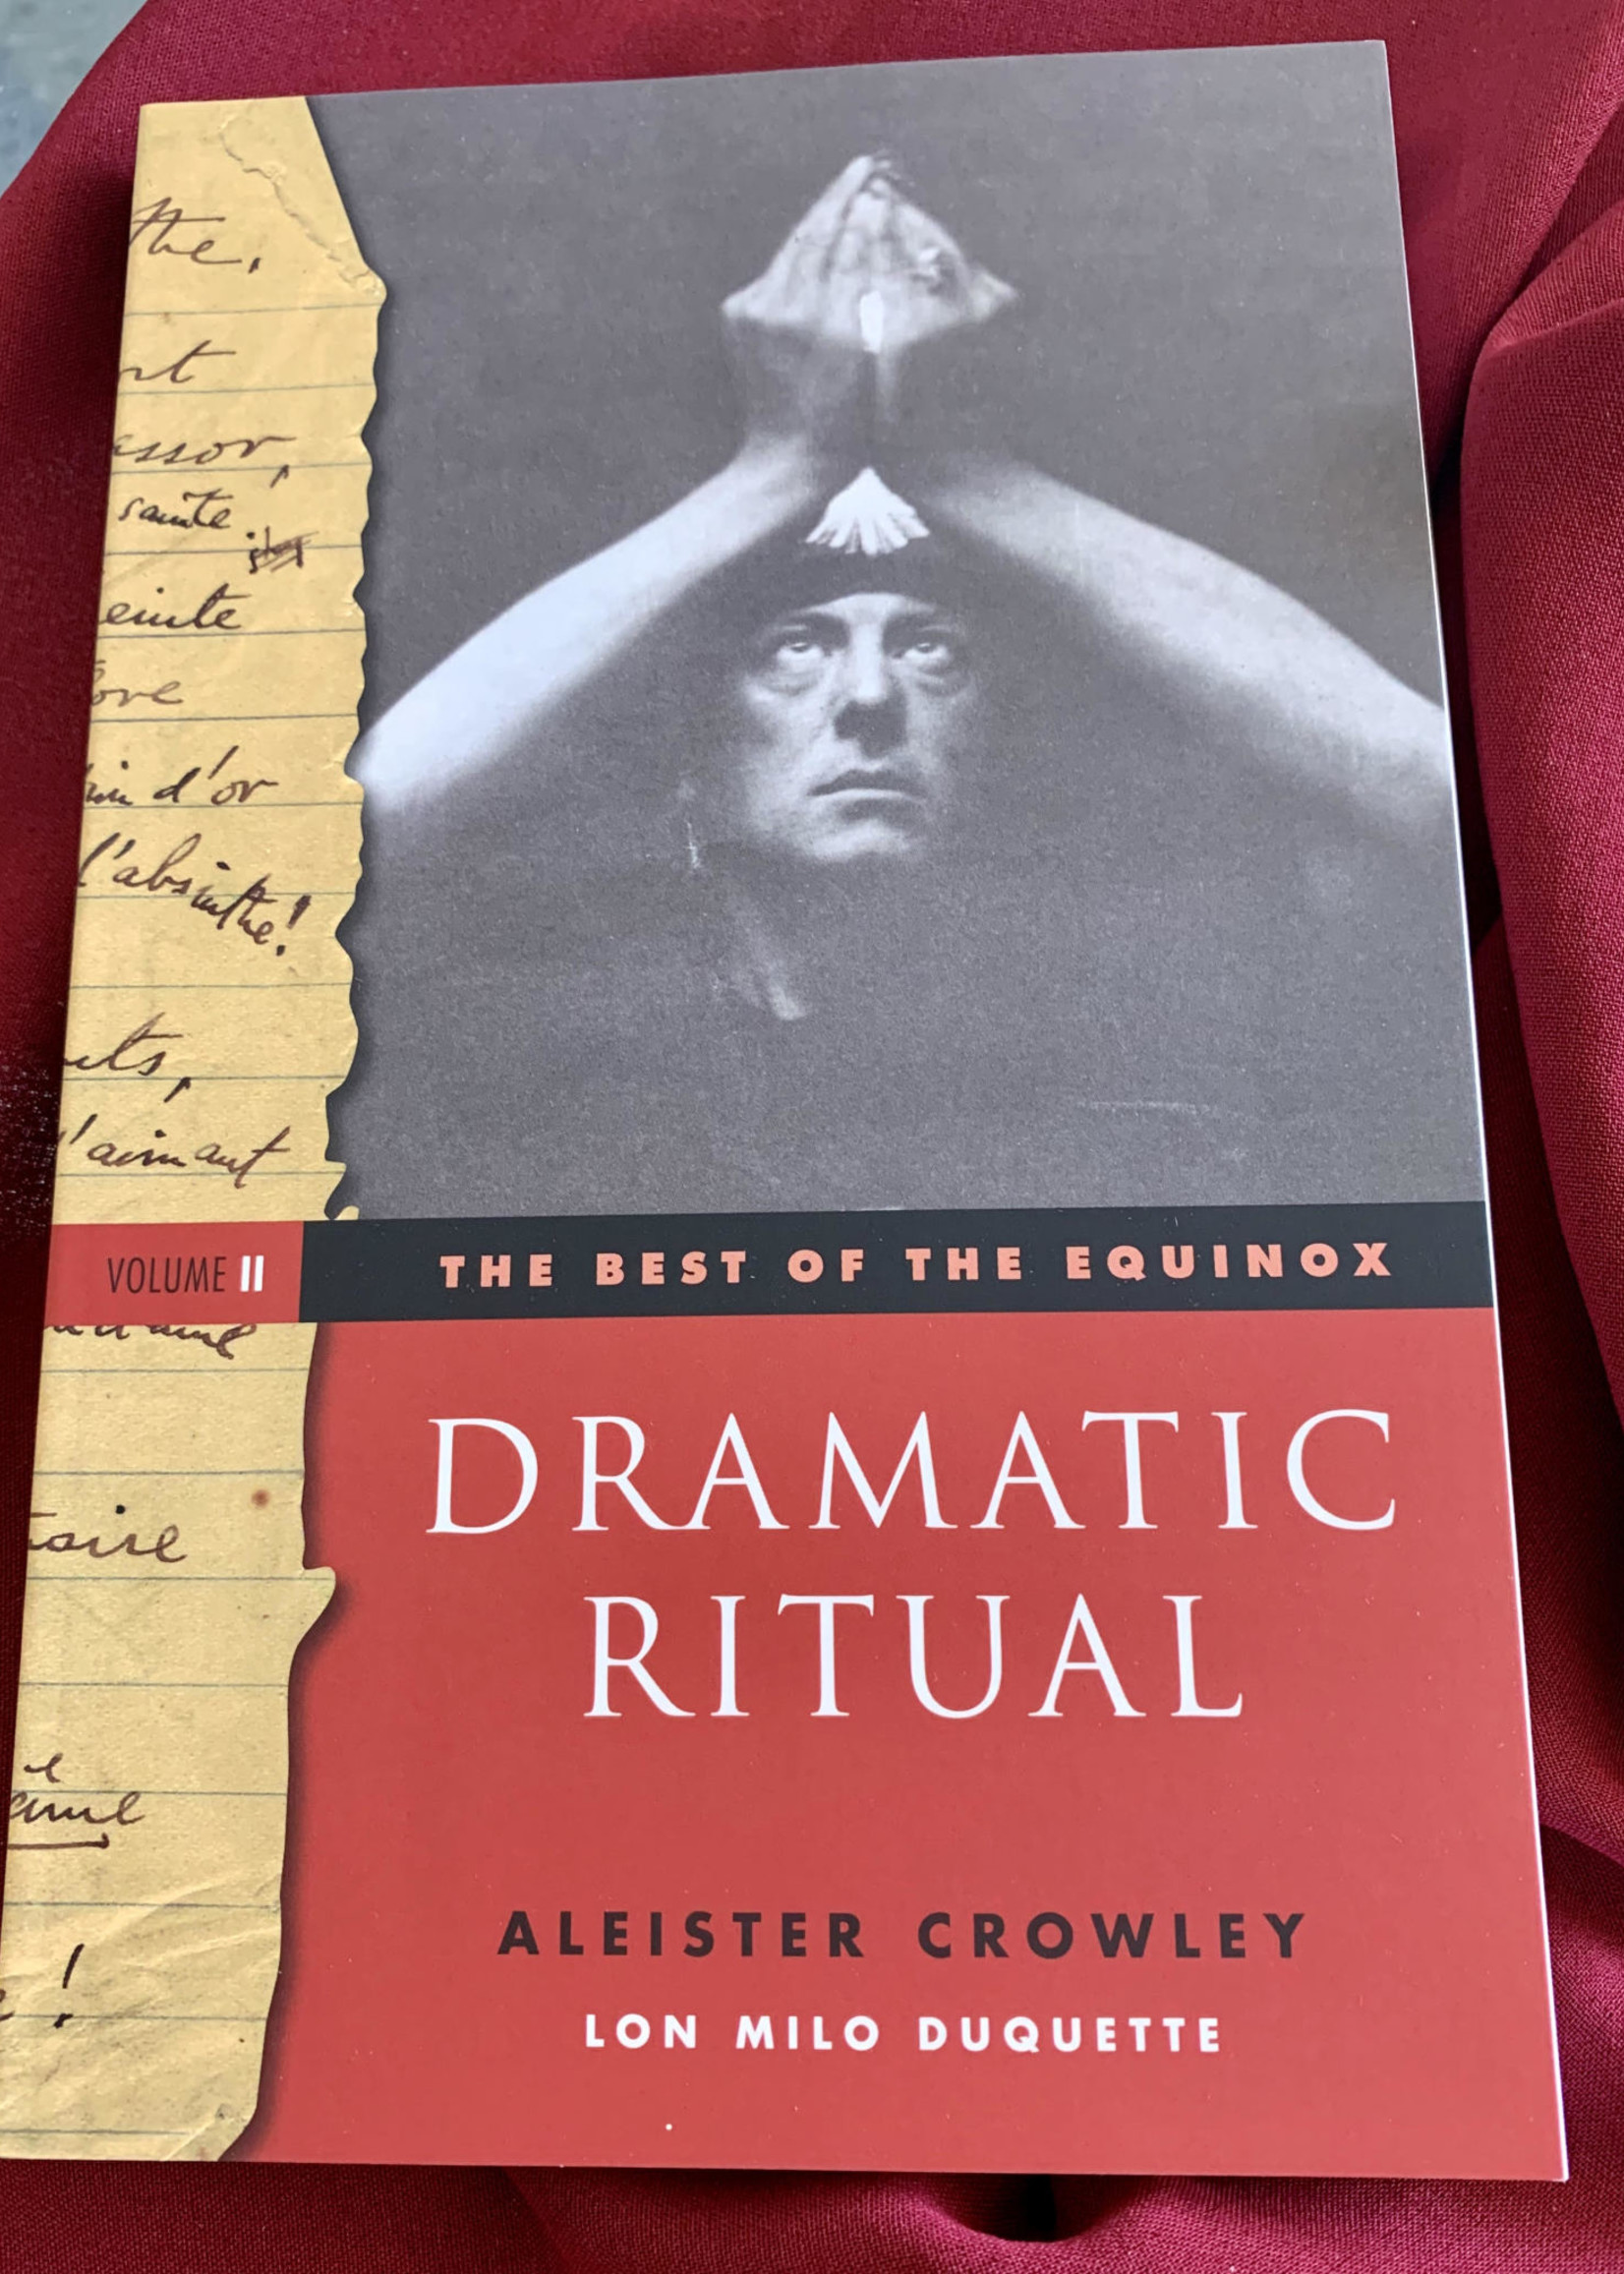 The Best of the Equinox, Dramatic Ritual Volume II